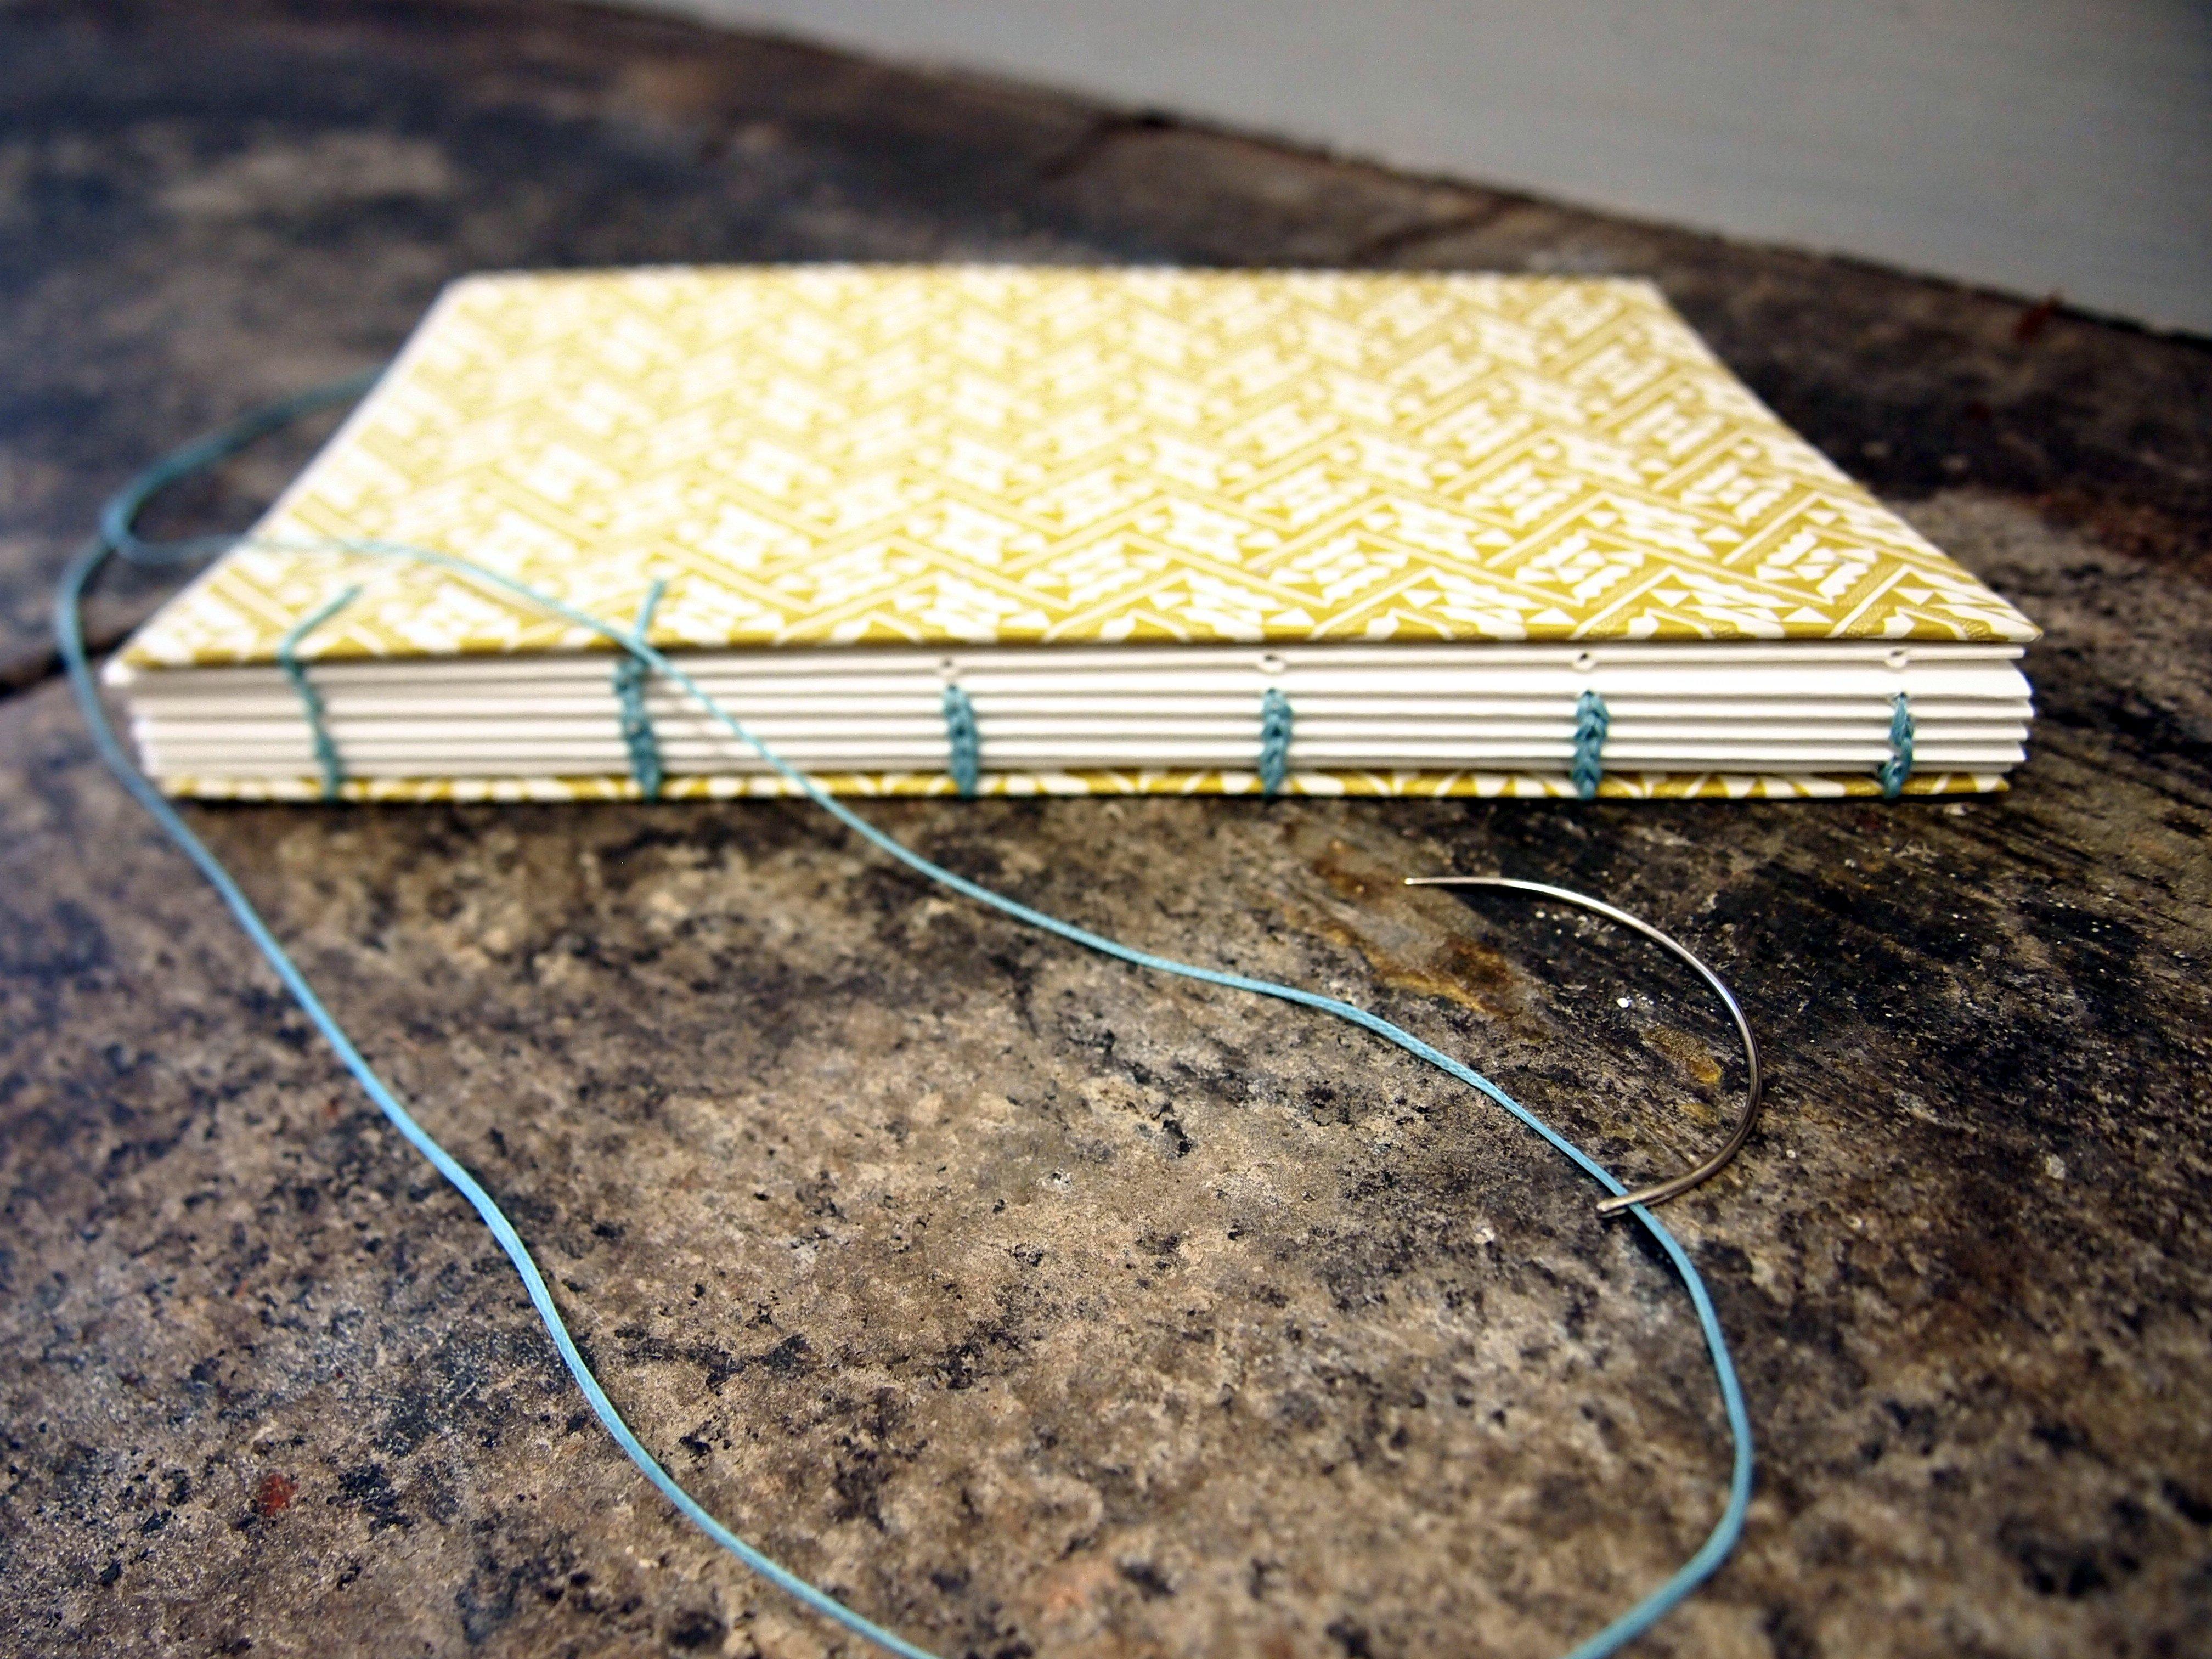 Curved Bookbinding Needles - Coptic Binding